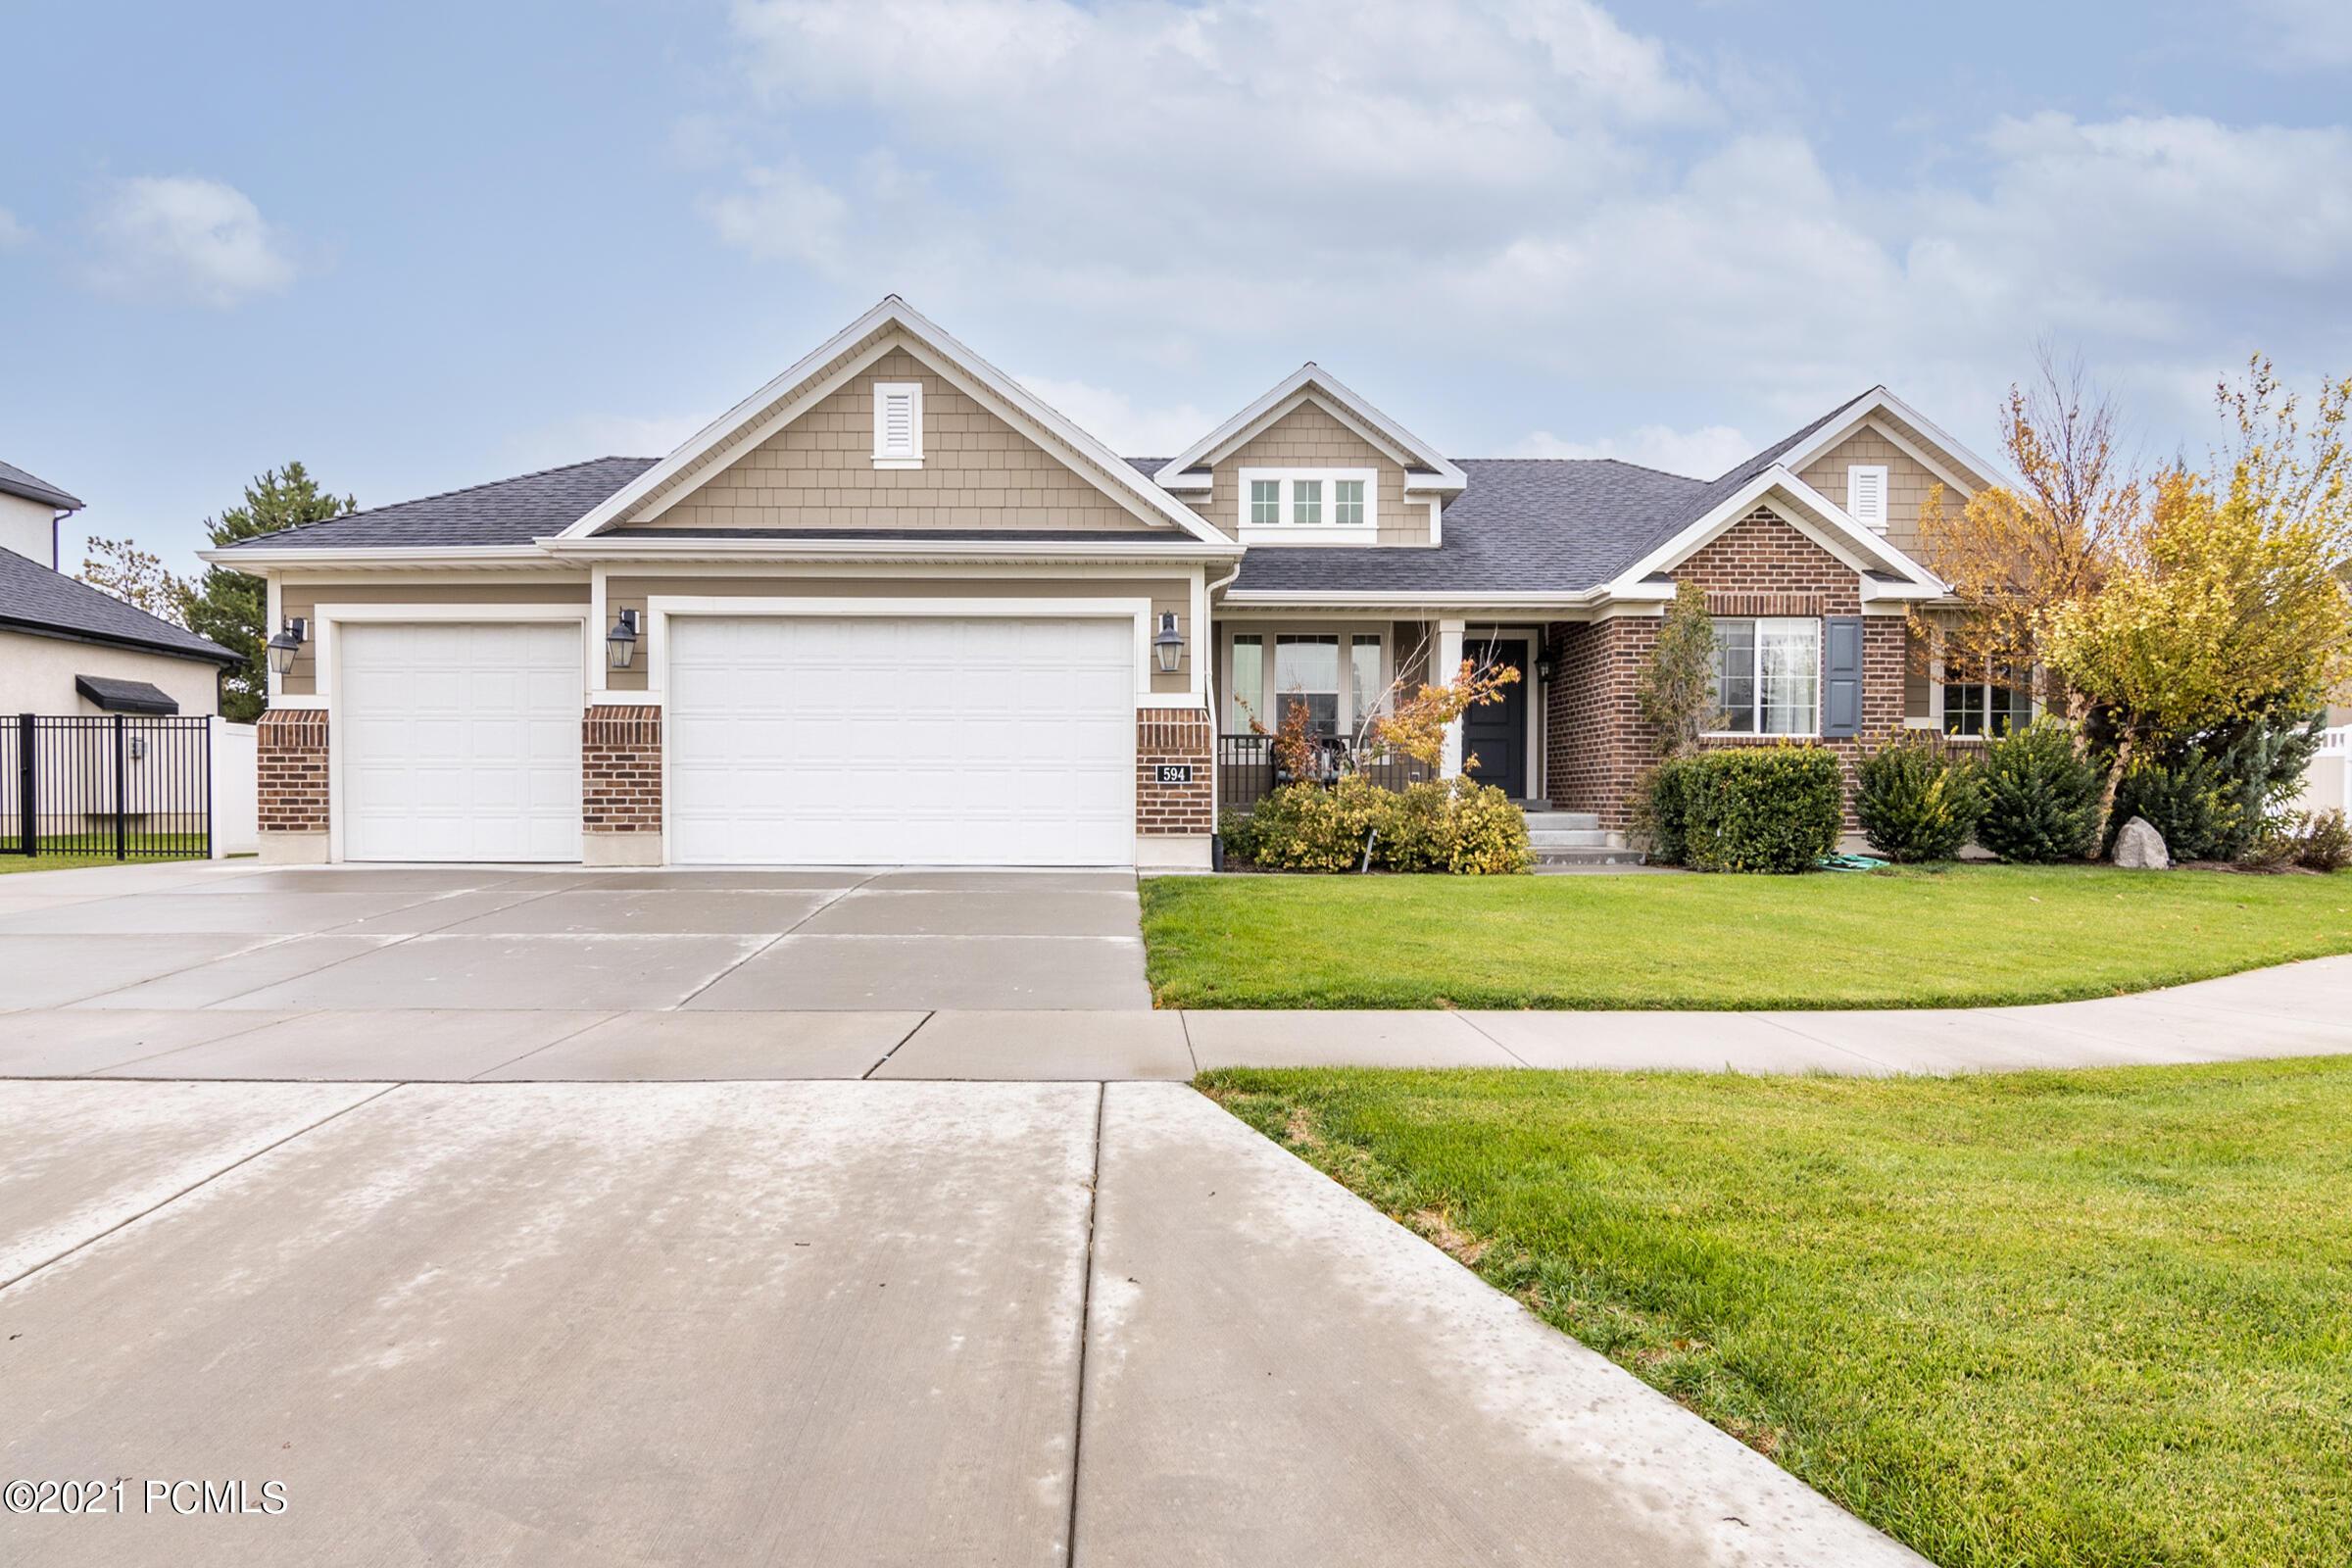 594 Galena Grove Way, Draper, Utah 84020, 6 Bedrooms Bedrooms, ,4 BathroomsBathrooms,Single Family,For Sale,Galena Grove,12104180